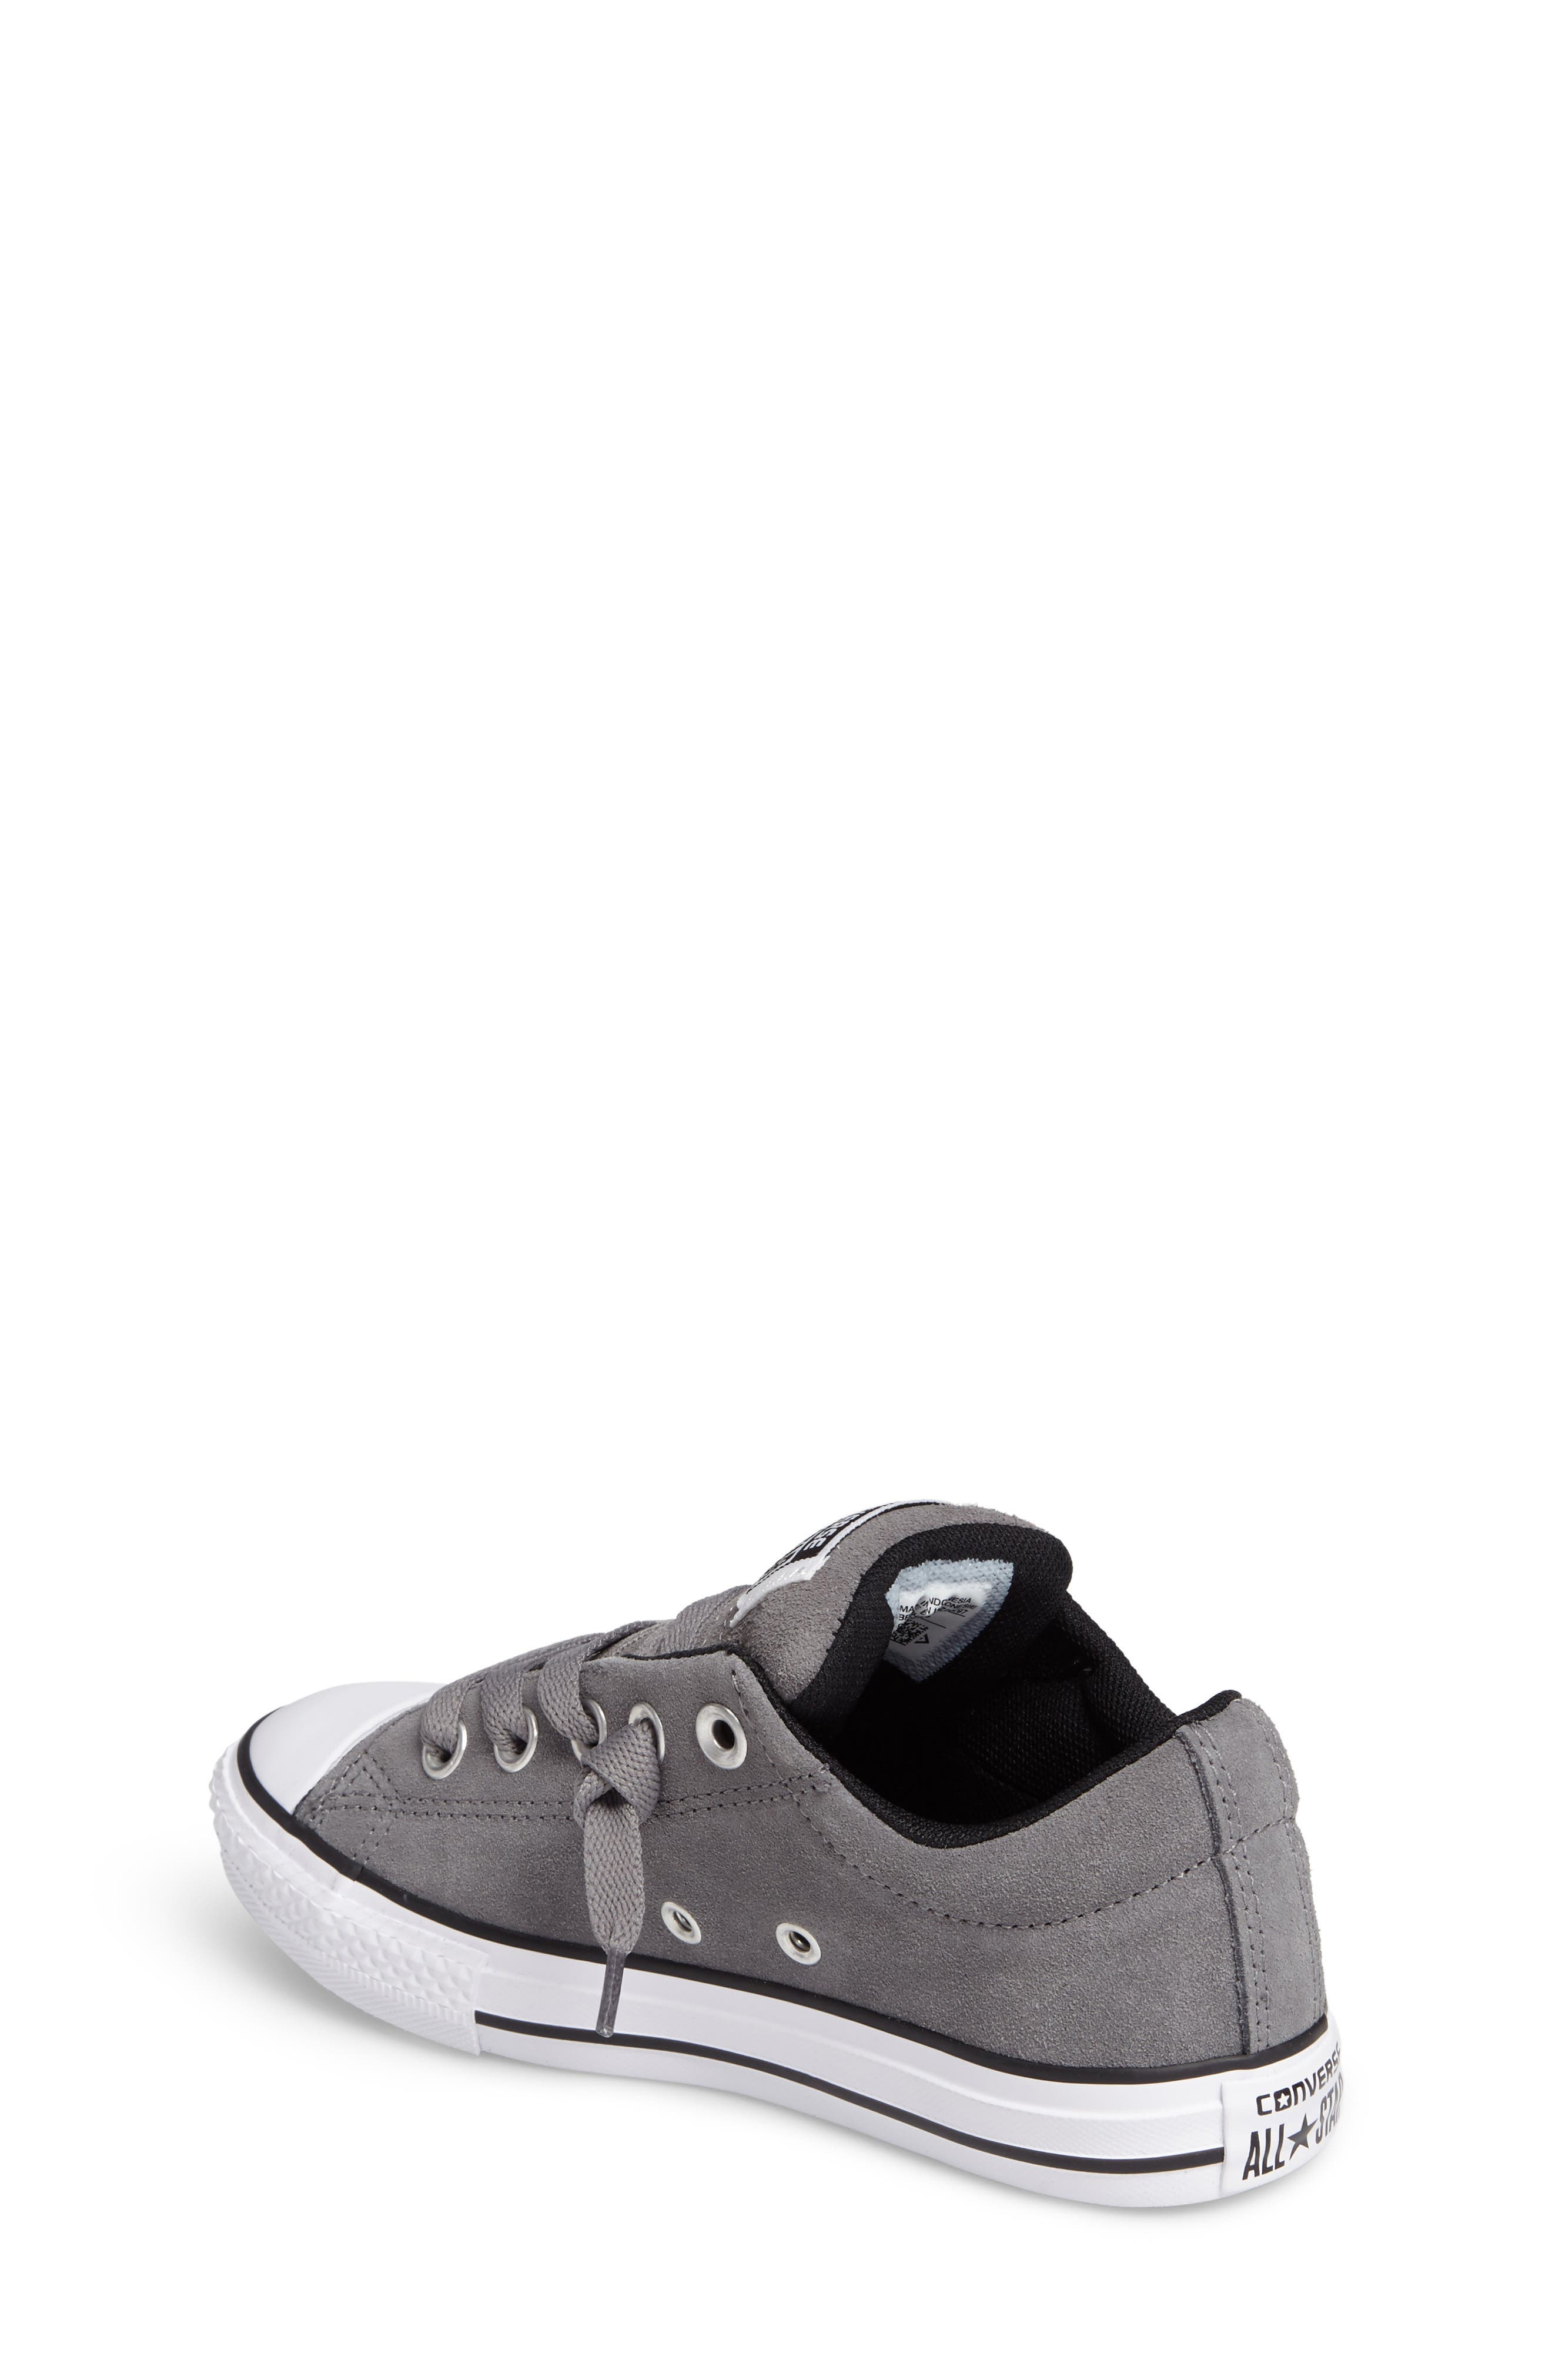 Chuck Taylor<sup>®</sup> All Star<sup>®</sup> Street Sneaker,                             Alternate thumbnail 2, color,                             Mason/ Black/ White